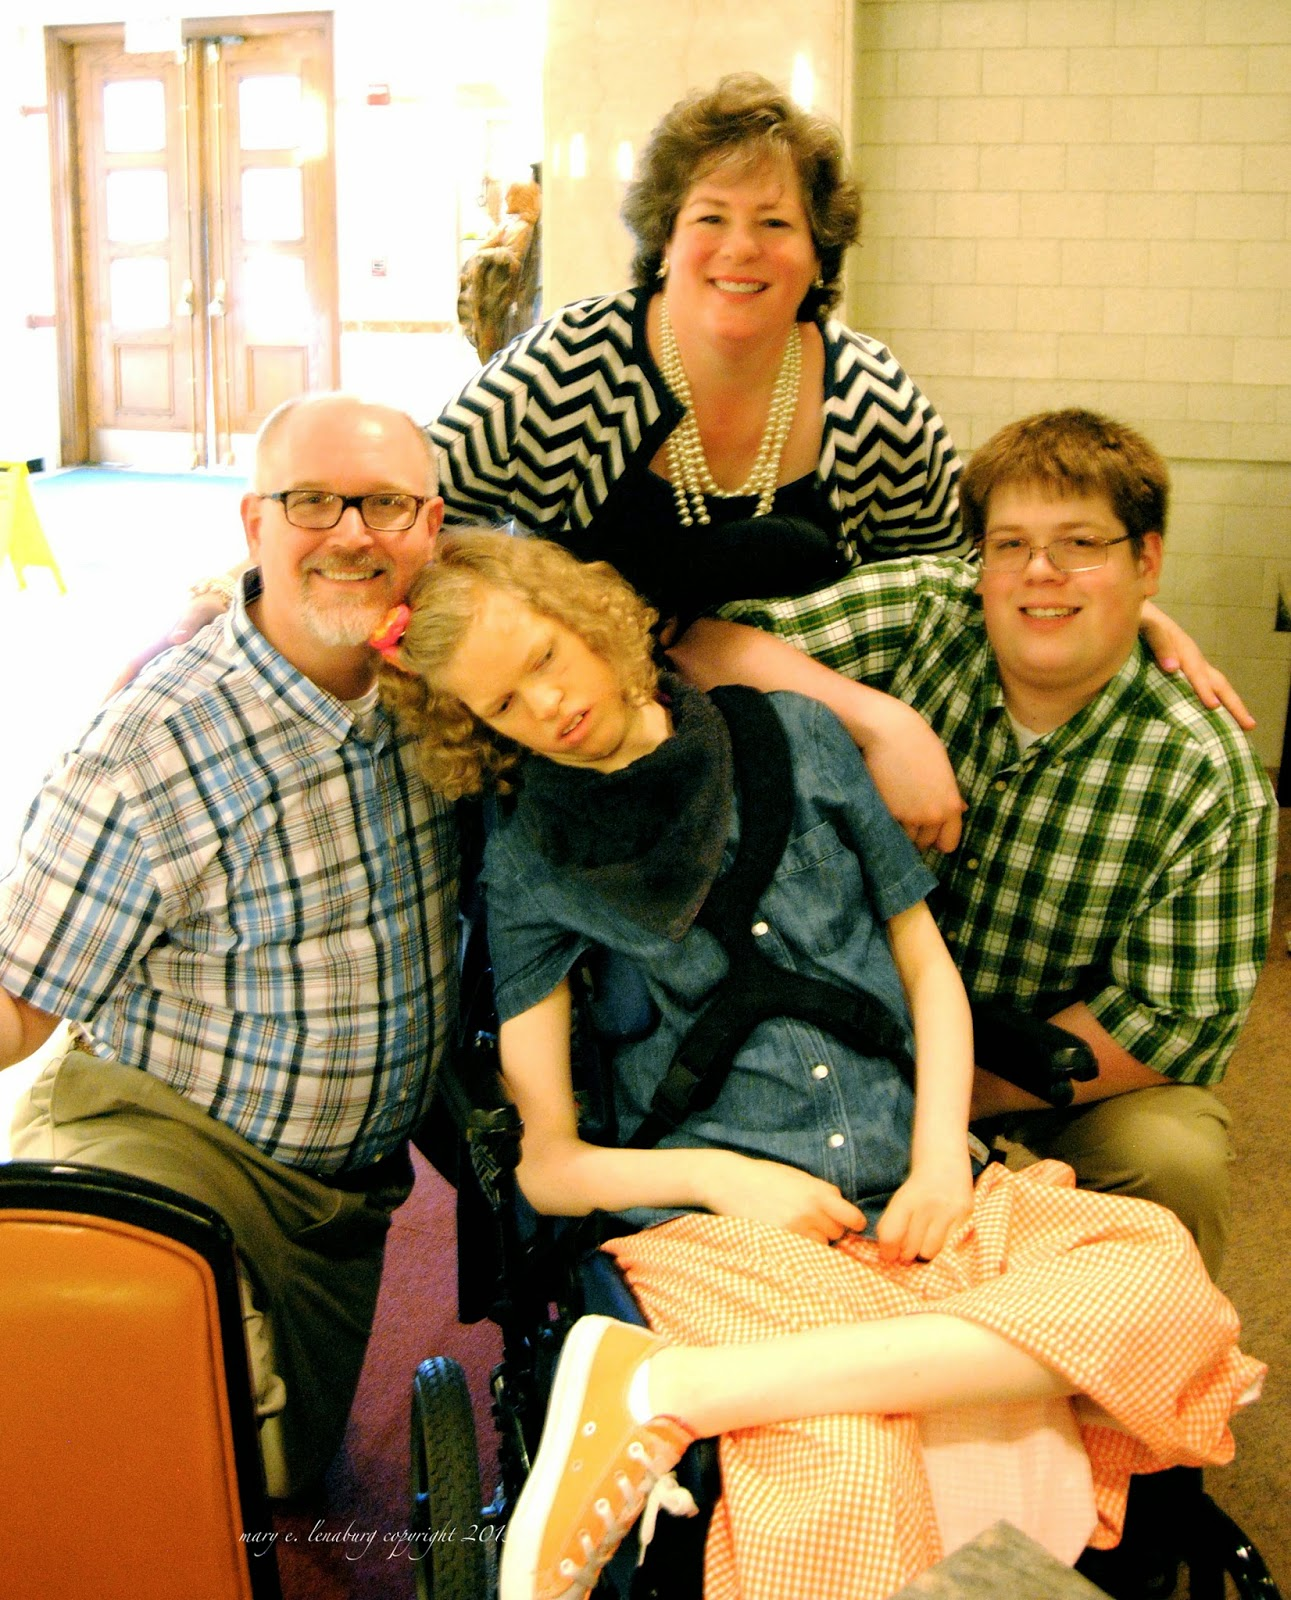 http://passionateperseverance.blogspot.com/p/my-story.html